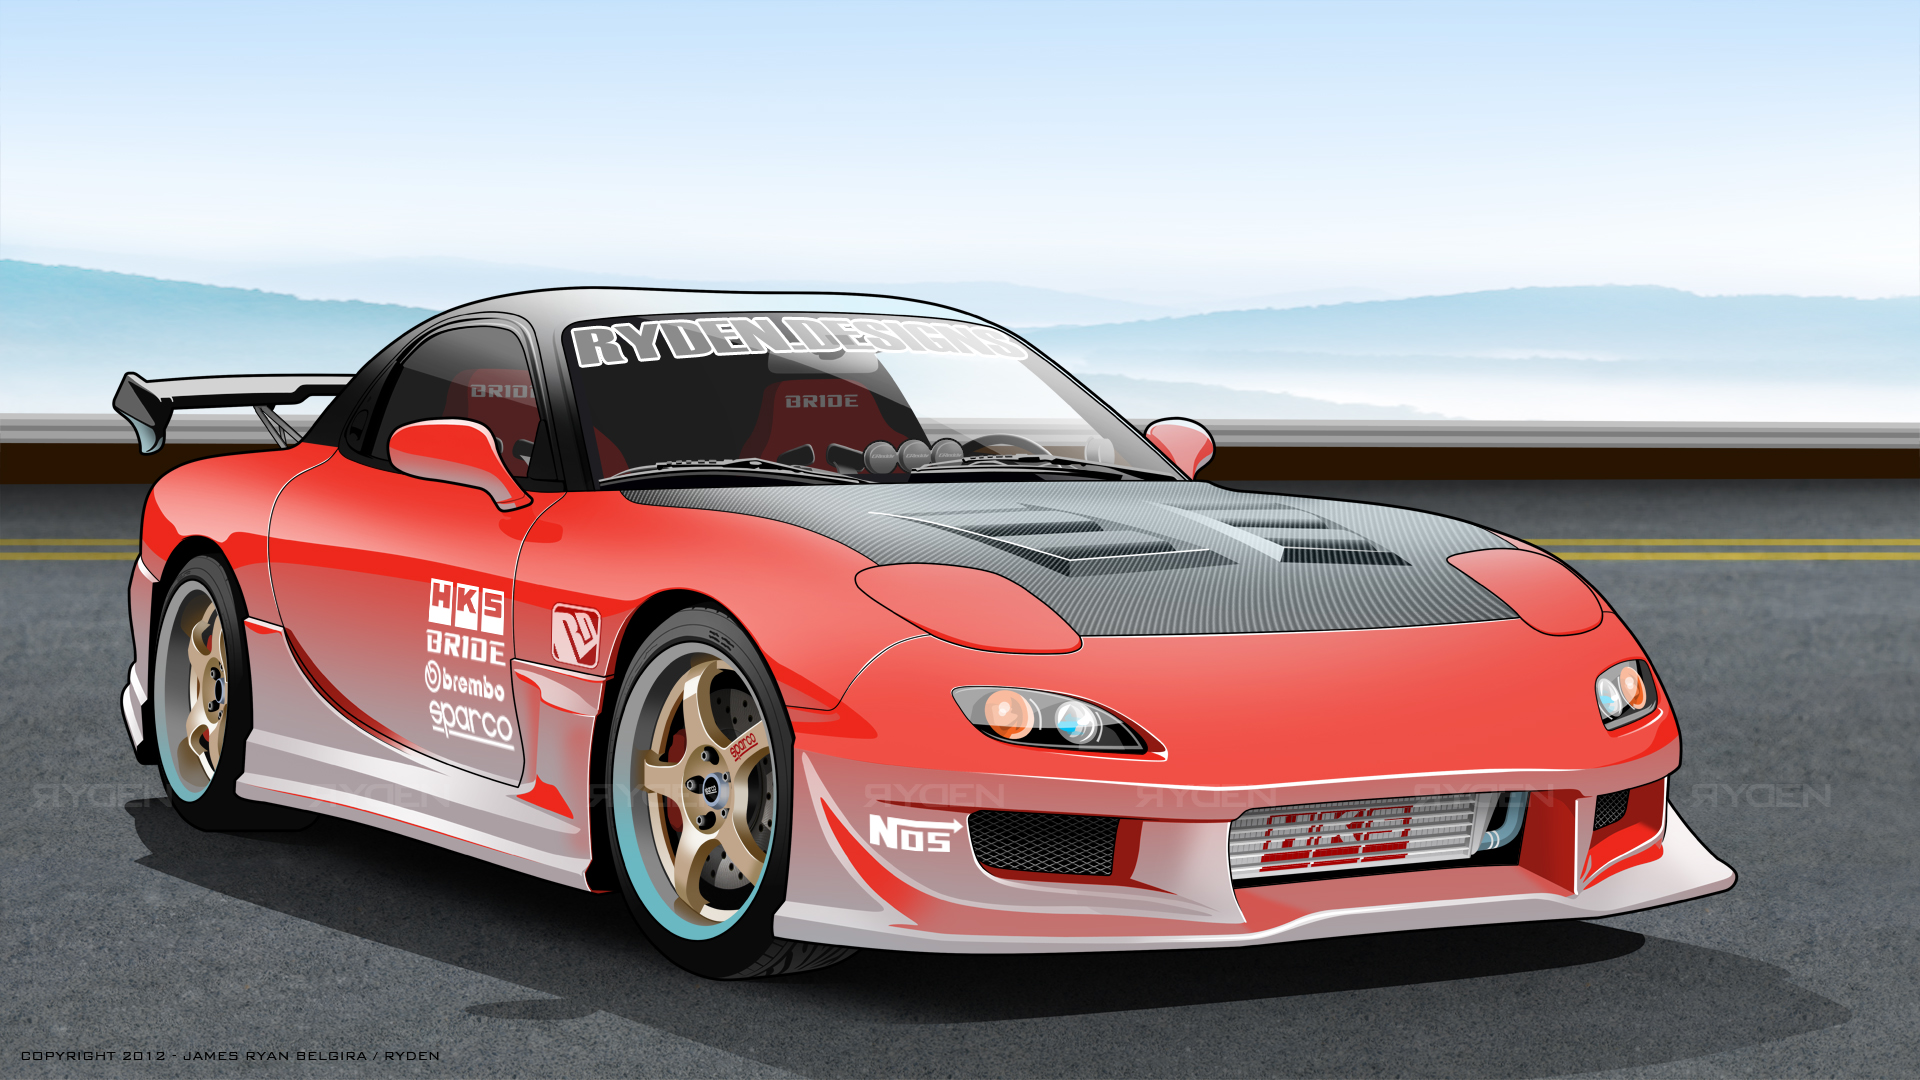 Mazda rx7 by ryden-belgira